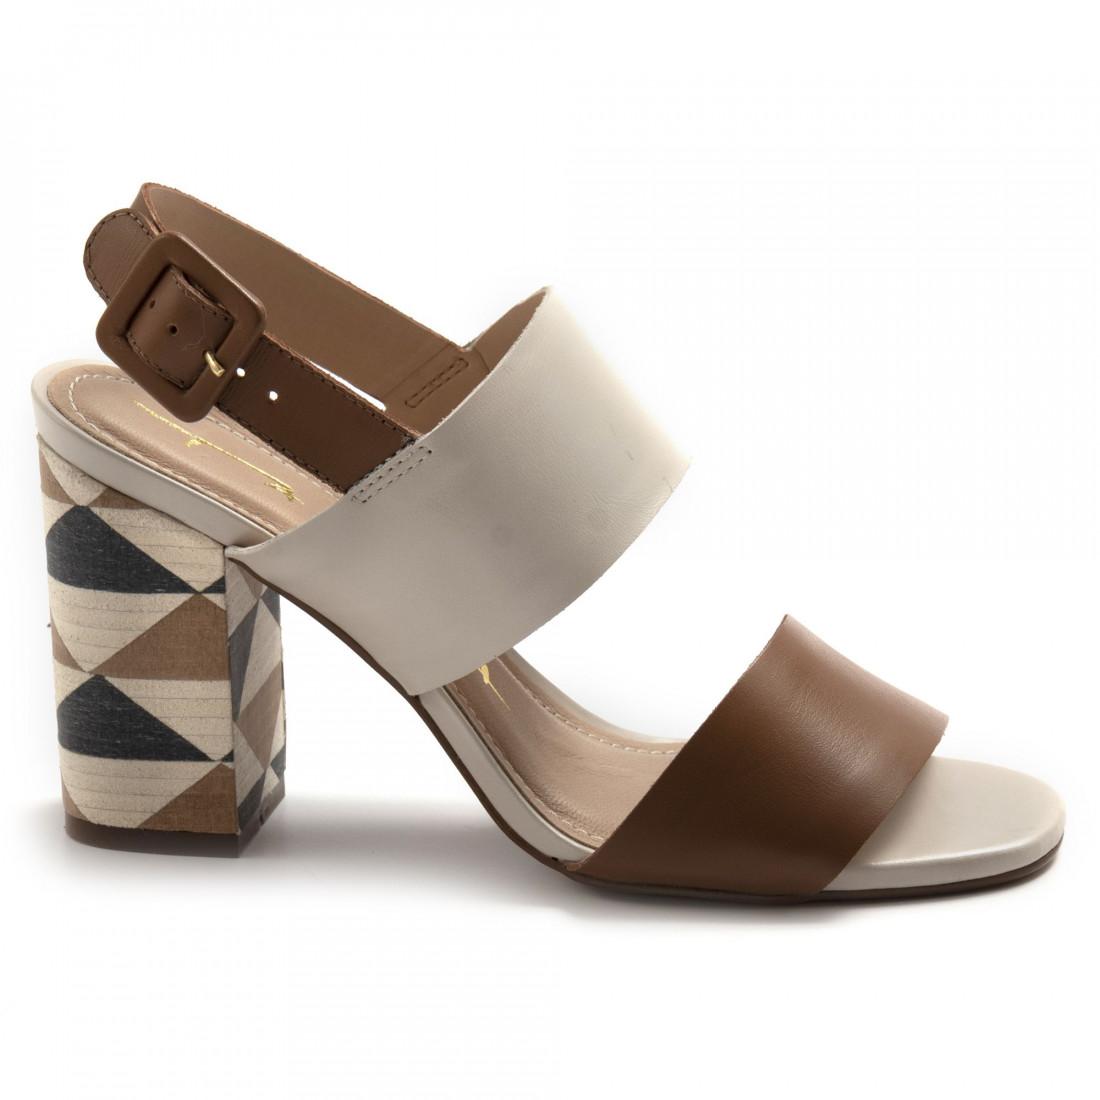 sandals woman tabita 1096728toscana caramelo 7345